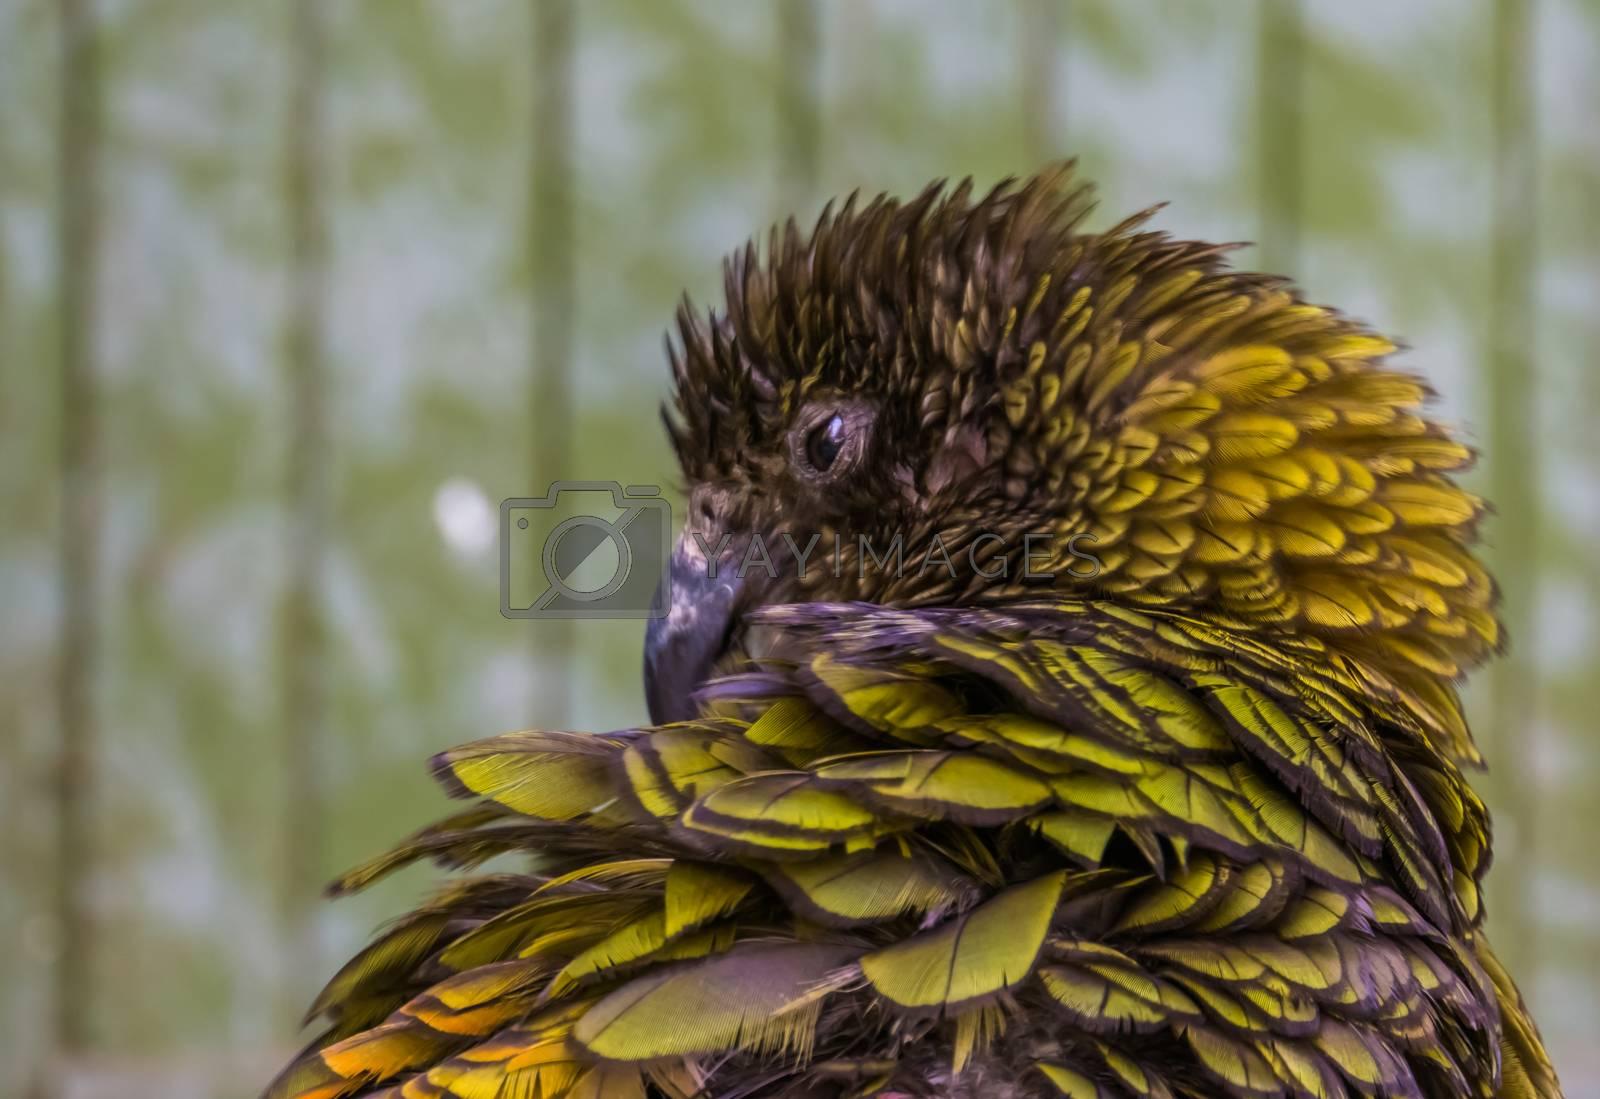 closeup of the face of a kea parrot, Alpine parrot from new zealand, Endangered bird specie